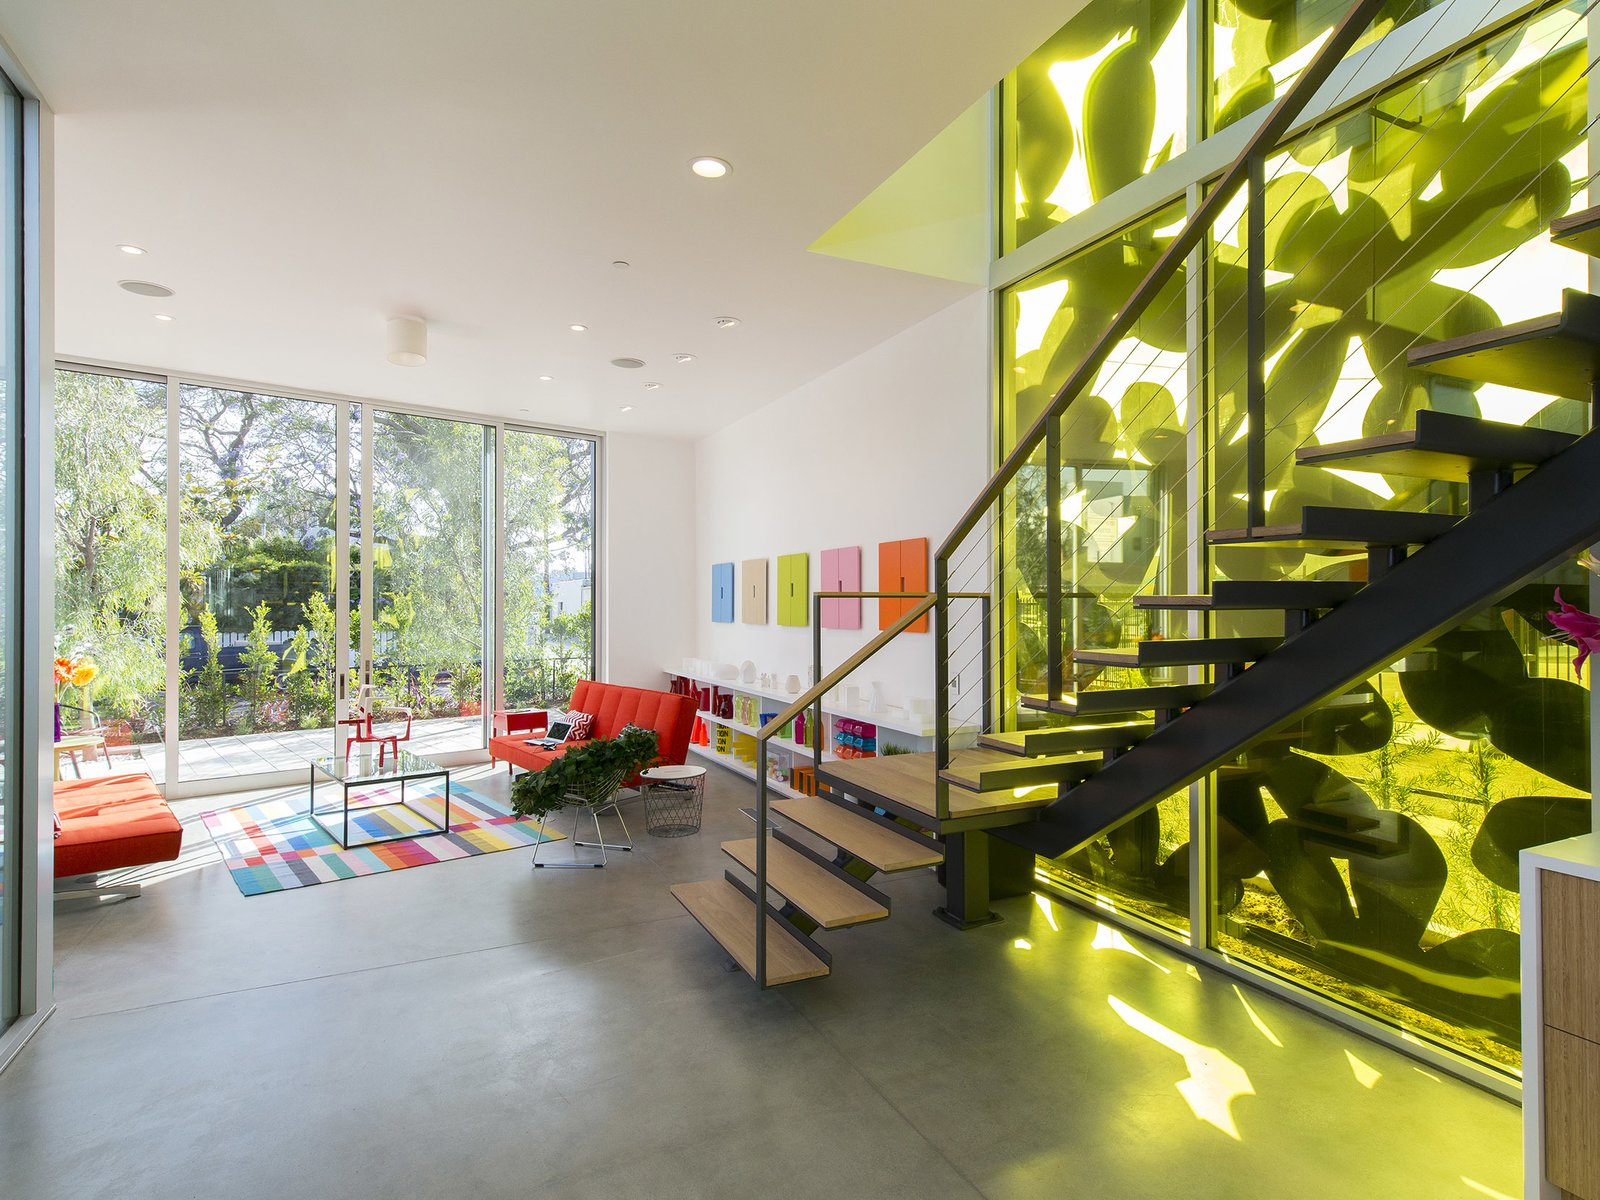 Living Room, Sofa, Shelves, Concrete Floor, and Recessed Lighting  Cameron McNall House